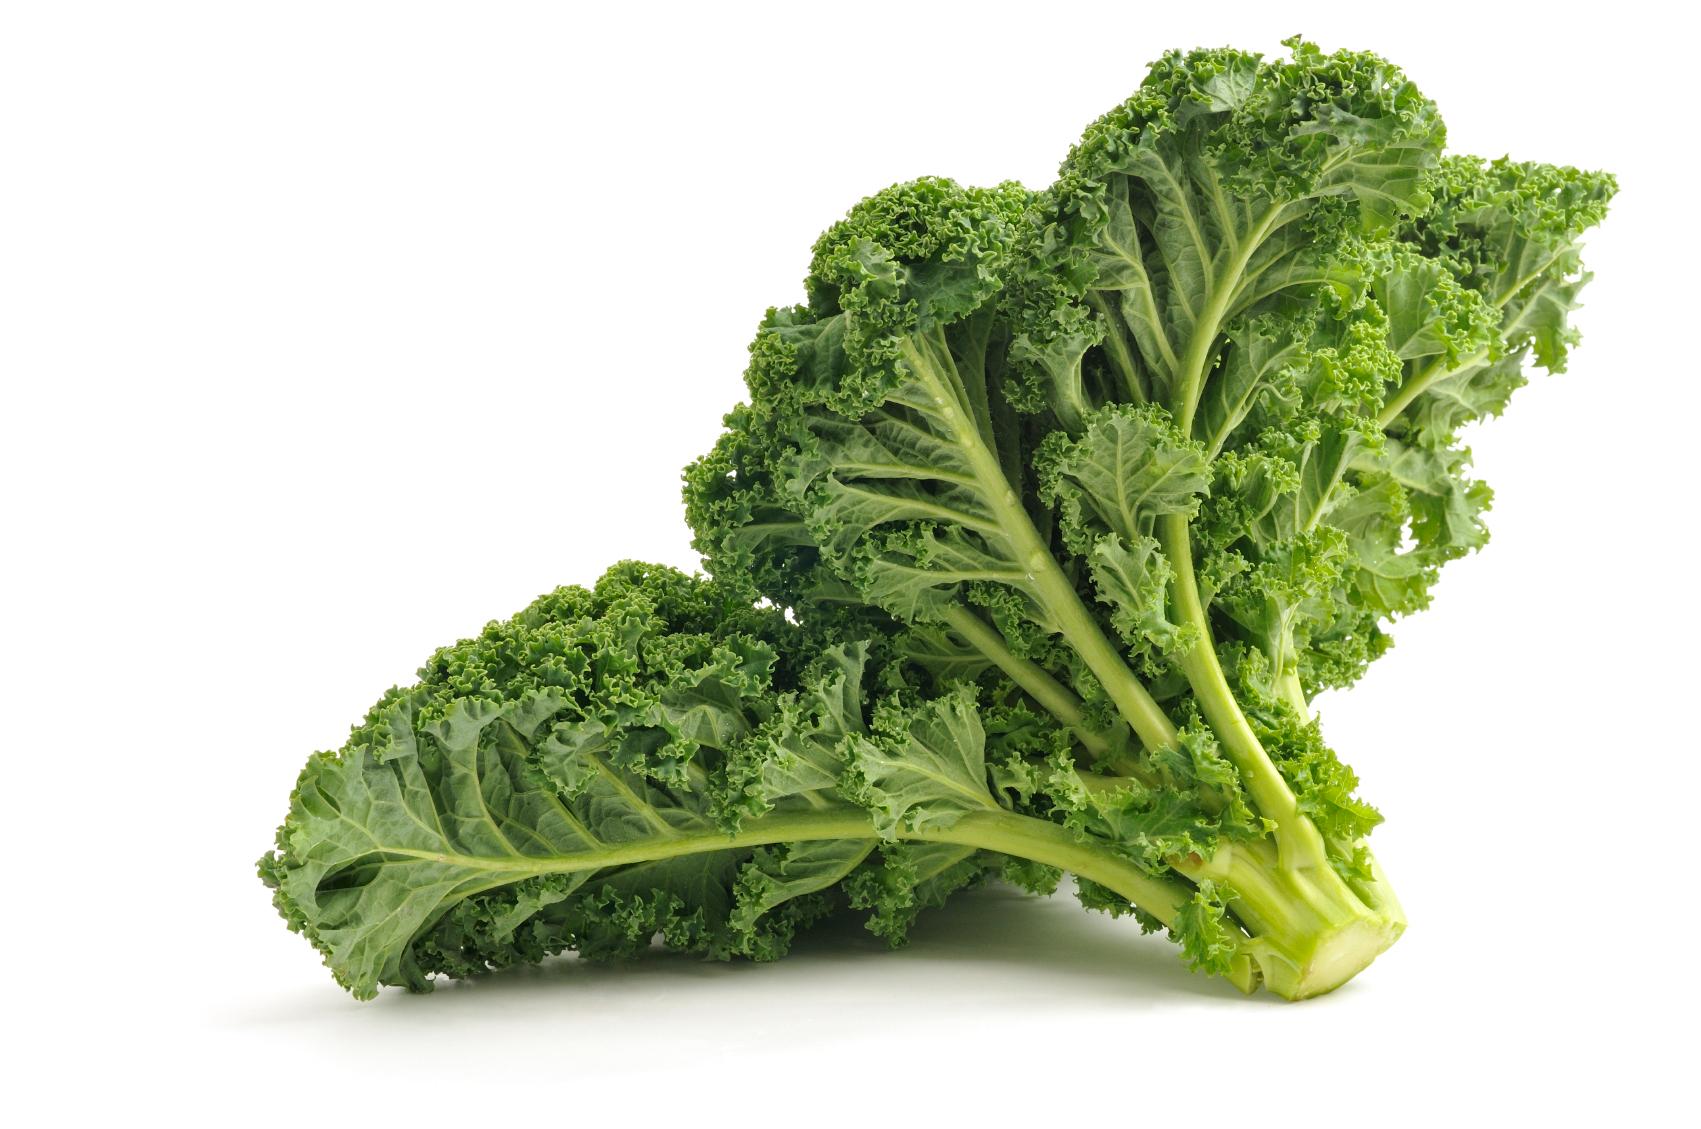 Kale-greens